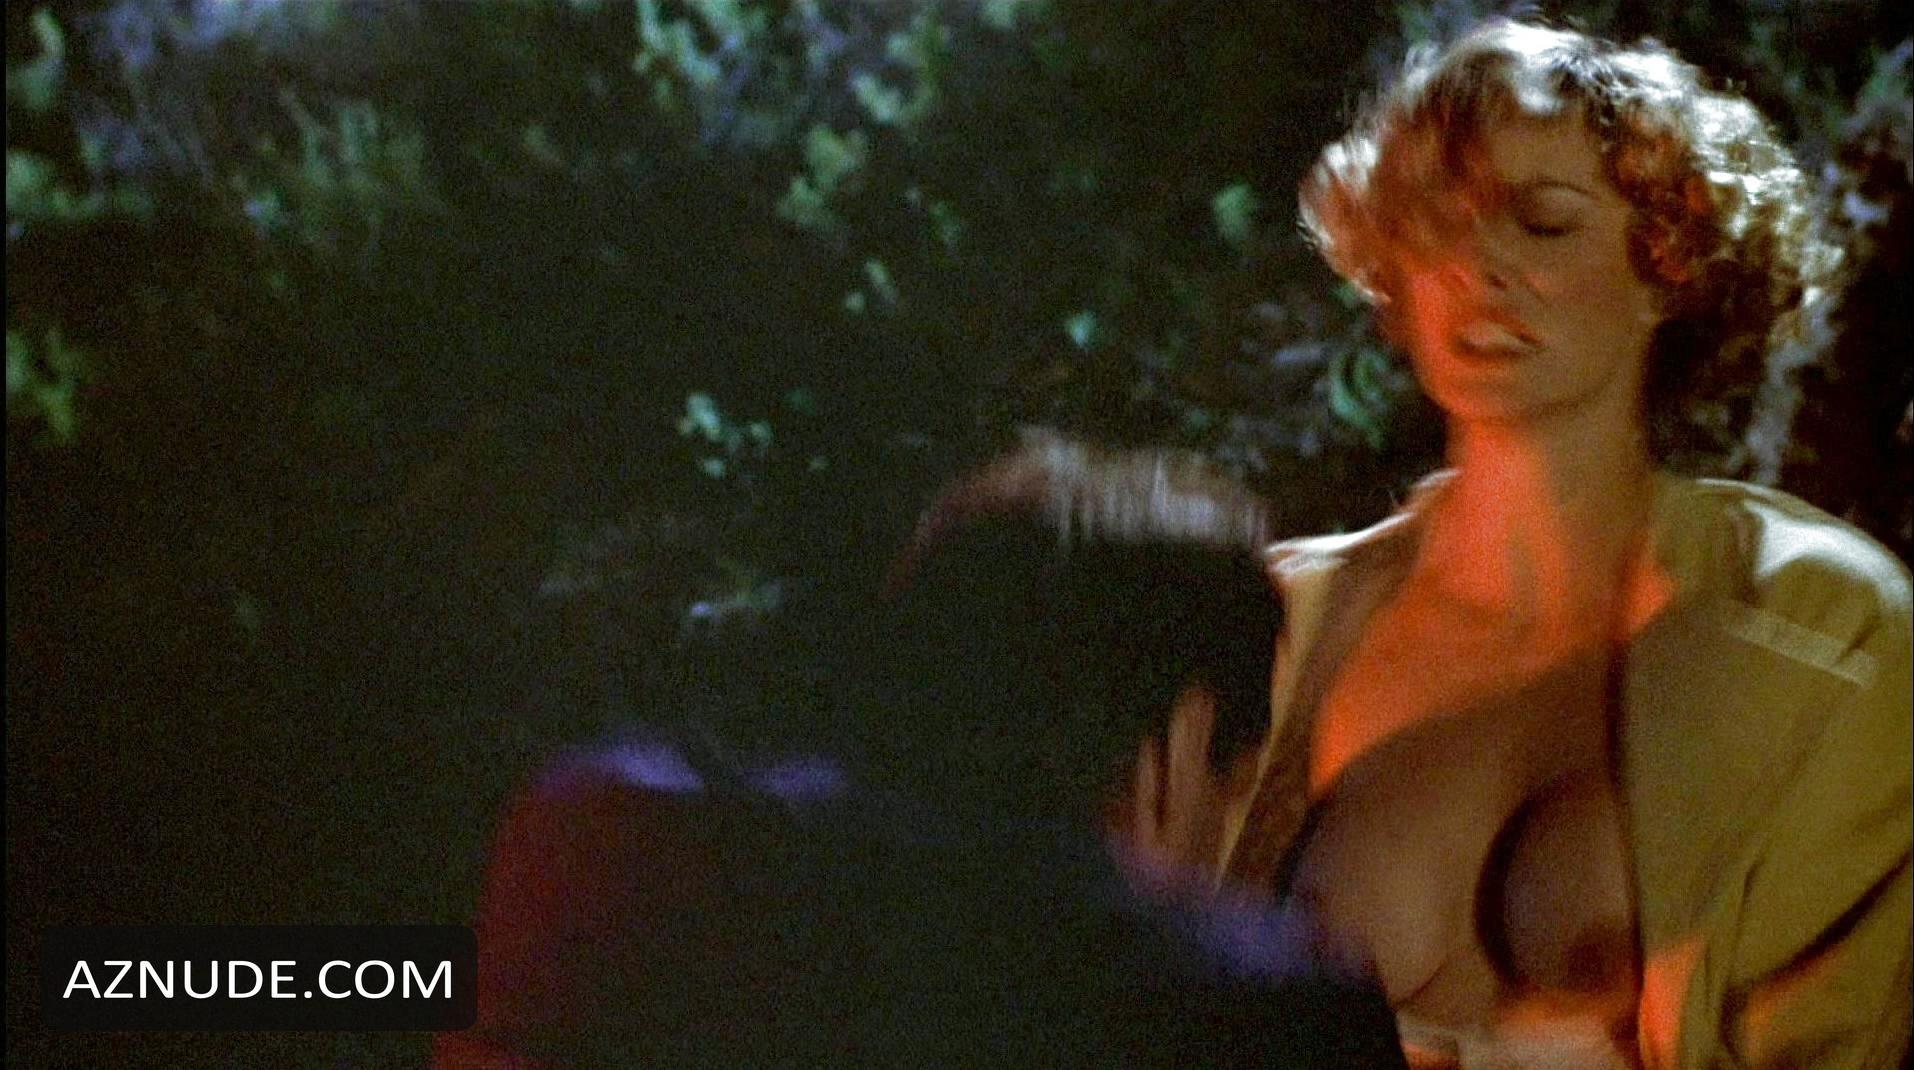 Порно мастурбация Женская мастурбация и дрочка